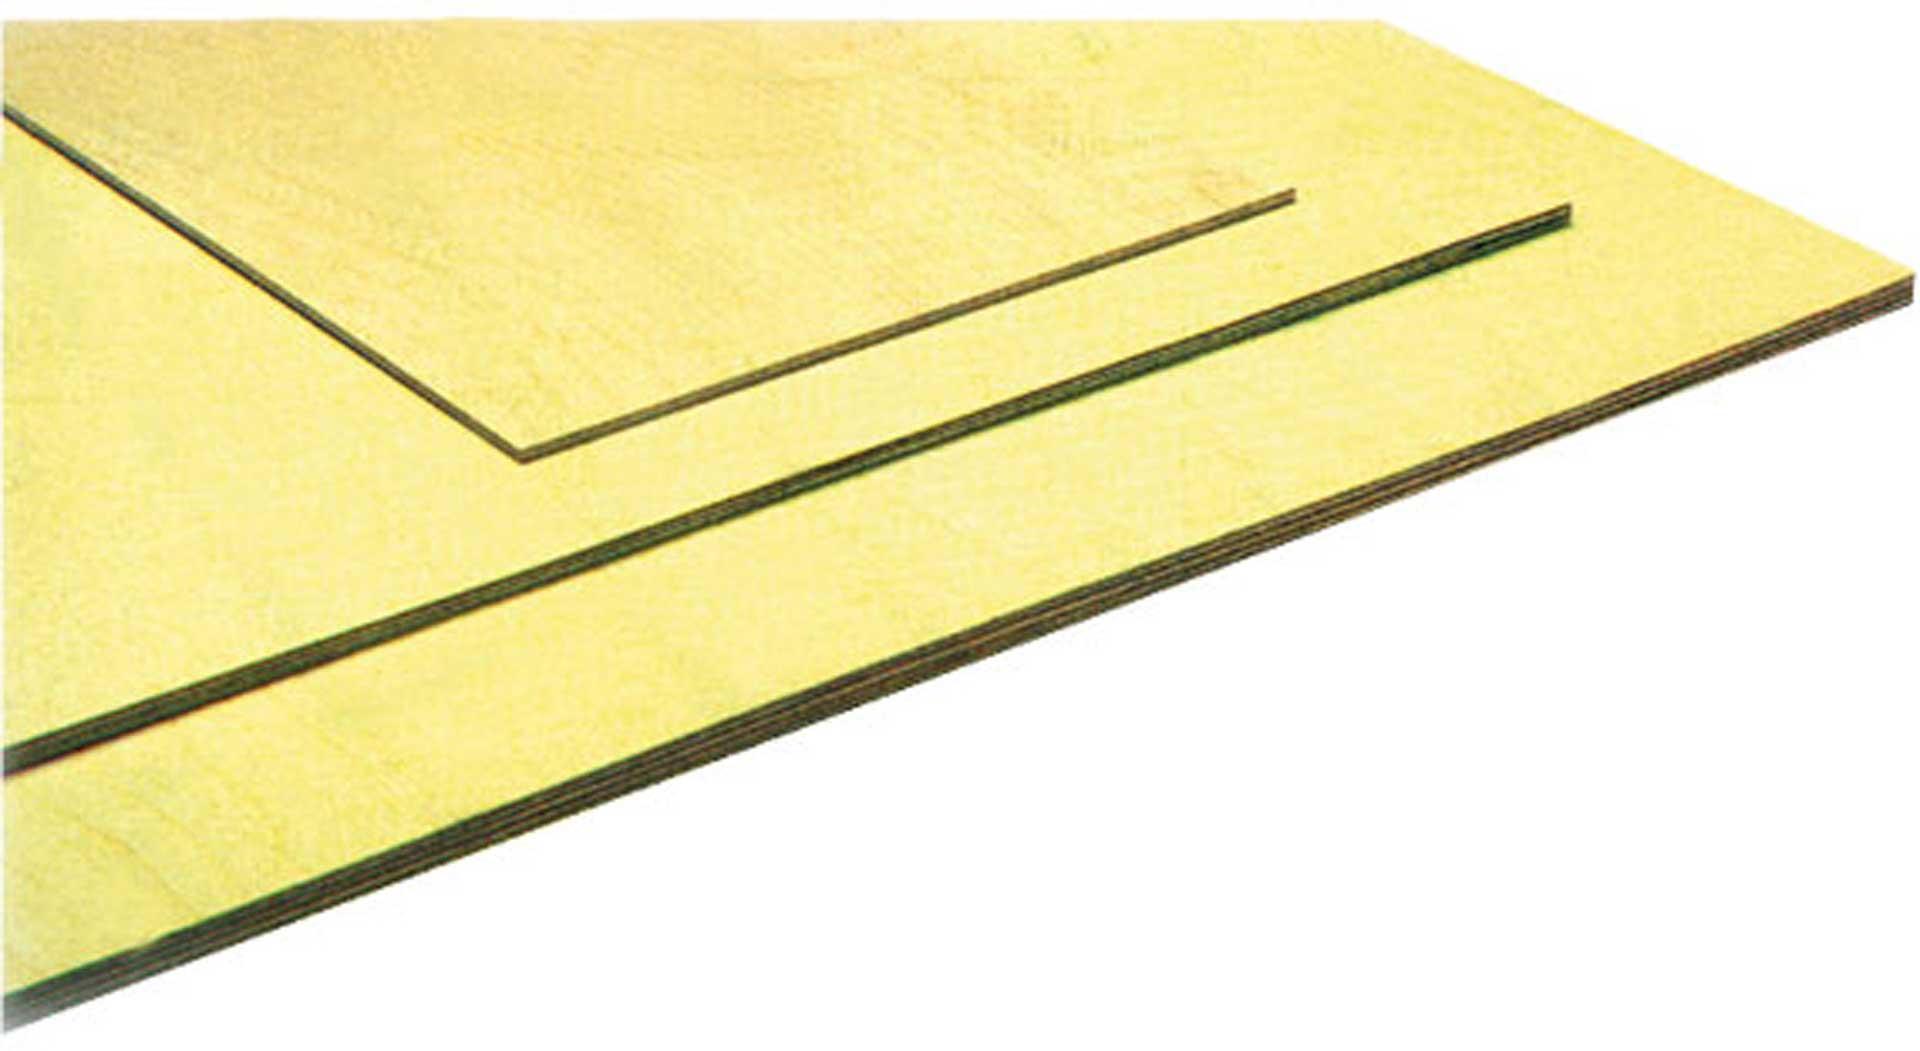 MODELLBAU LINDINGER BIRCH-SPERRY 0,6/300/1000MM